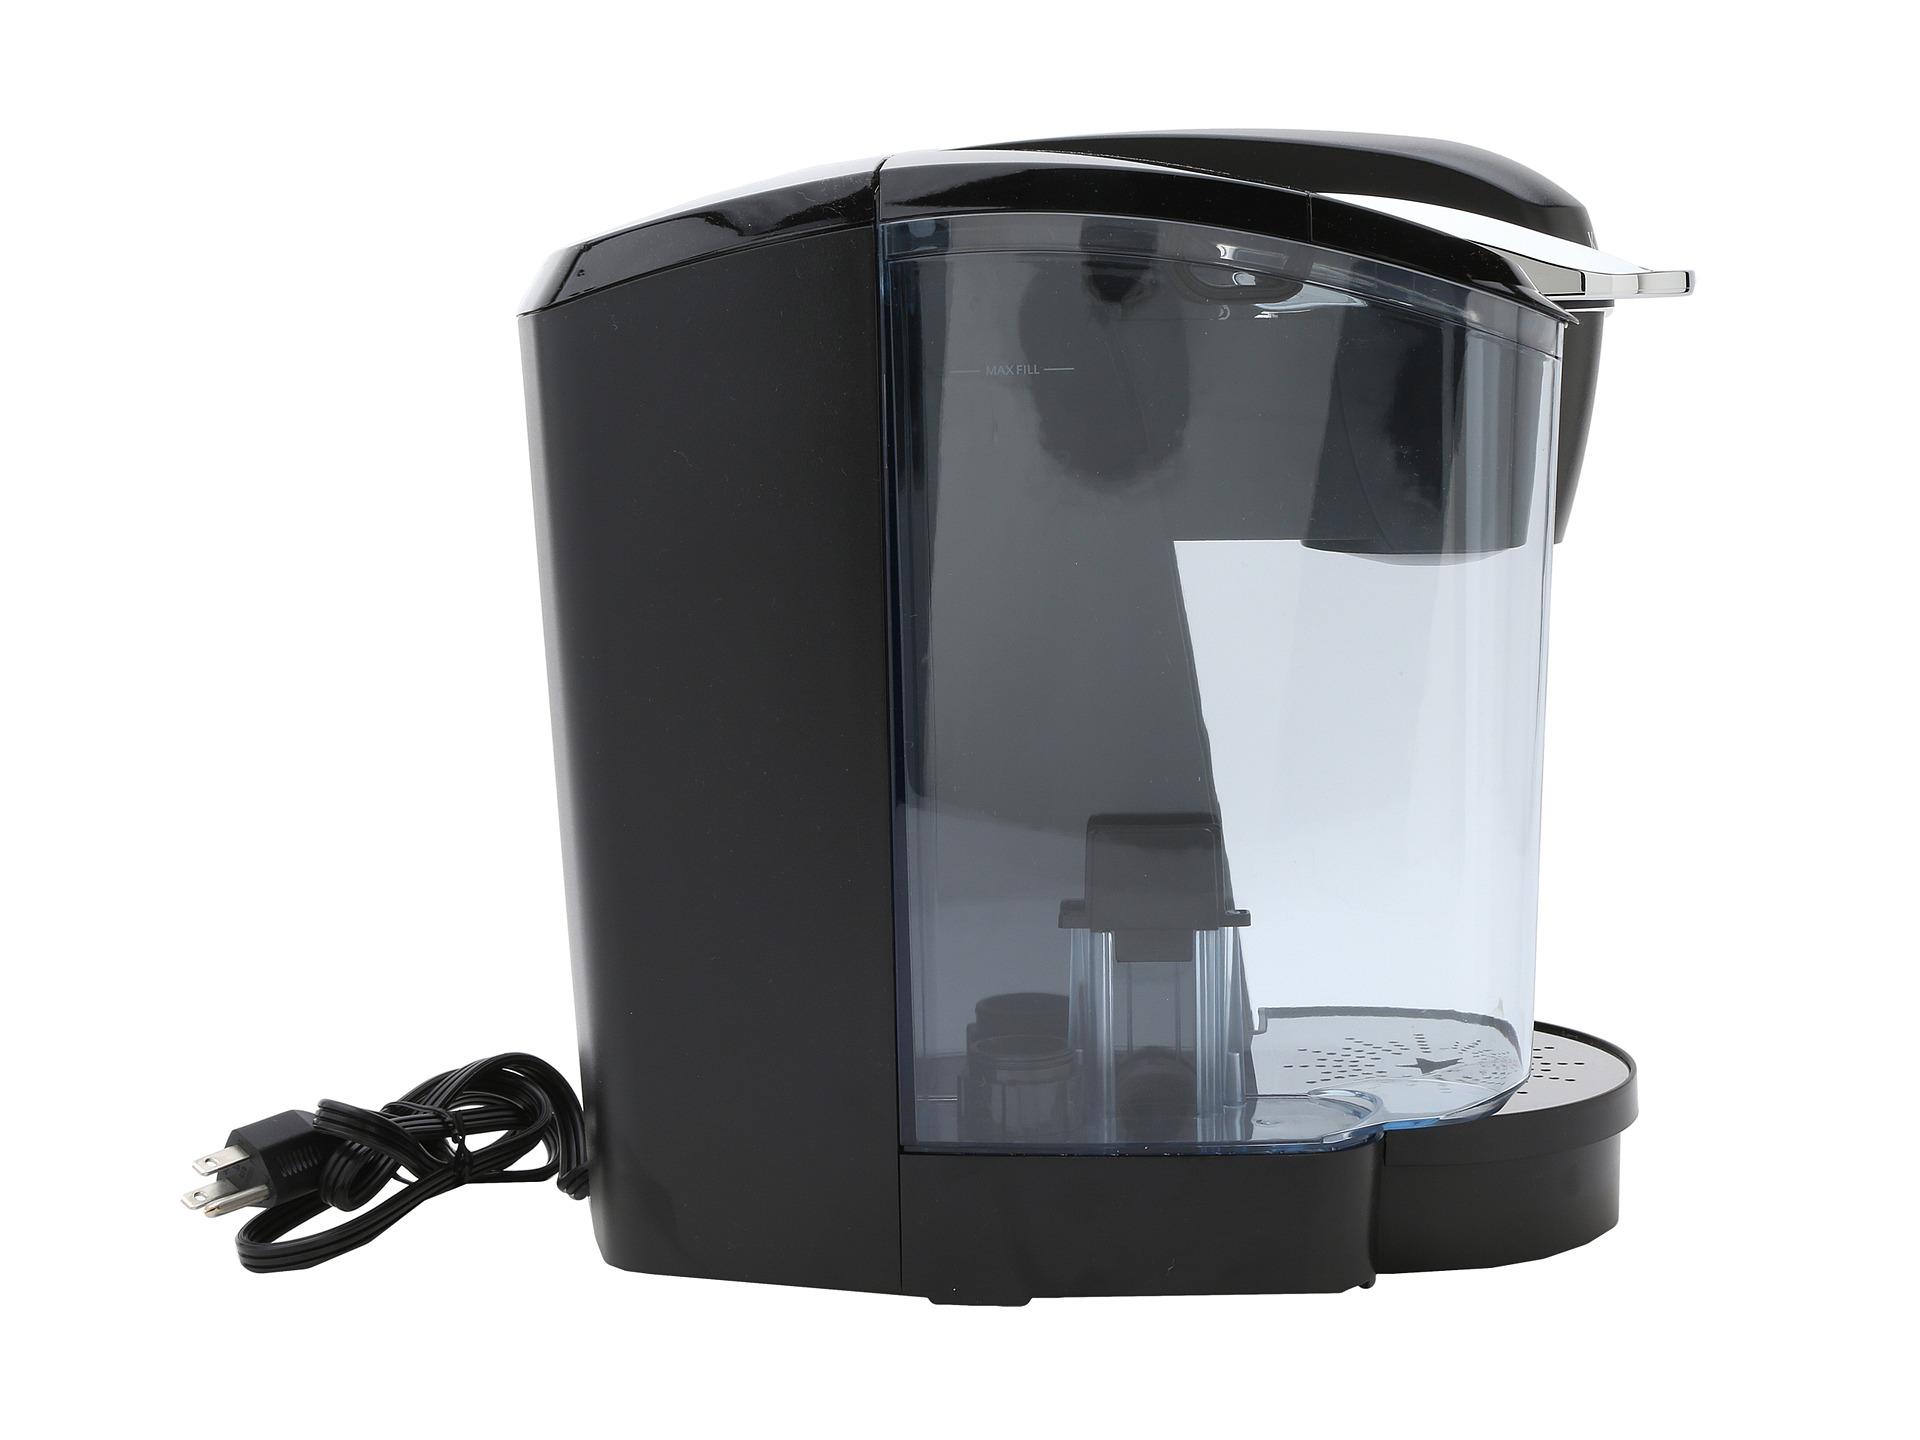 Keurig Coffee Maker K75 : No results for keurig k75 platinum - Search Zappos.com